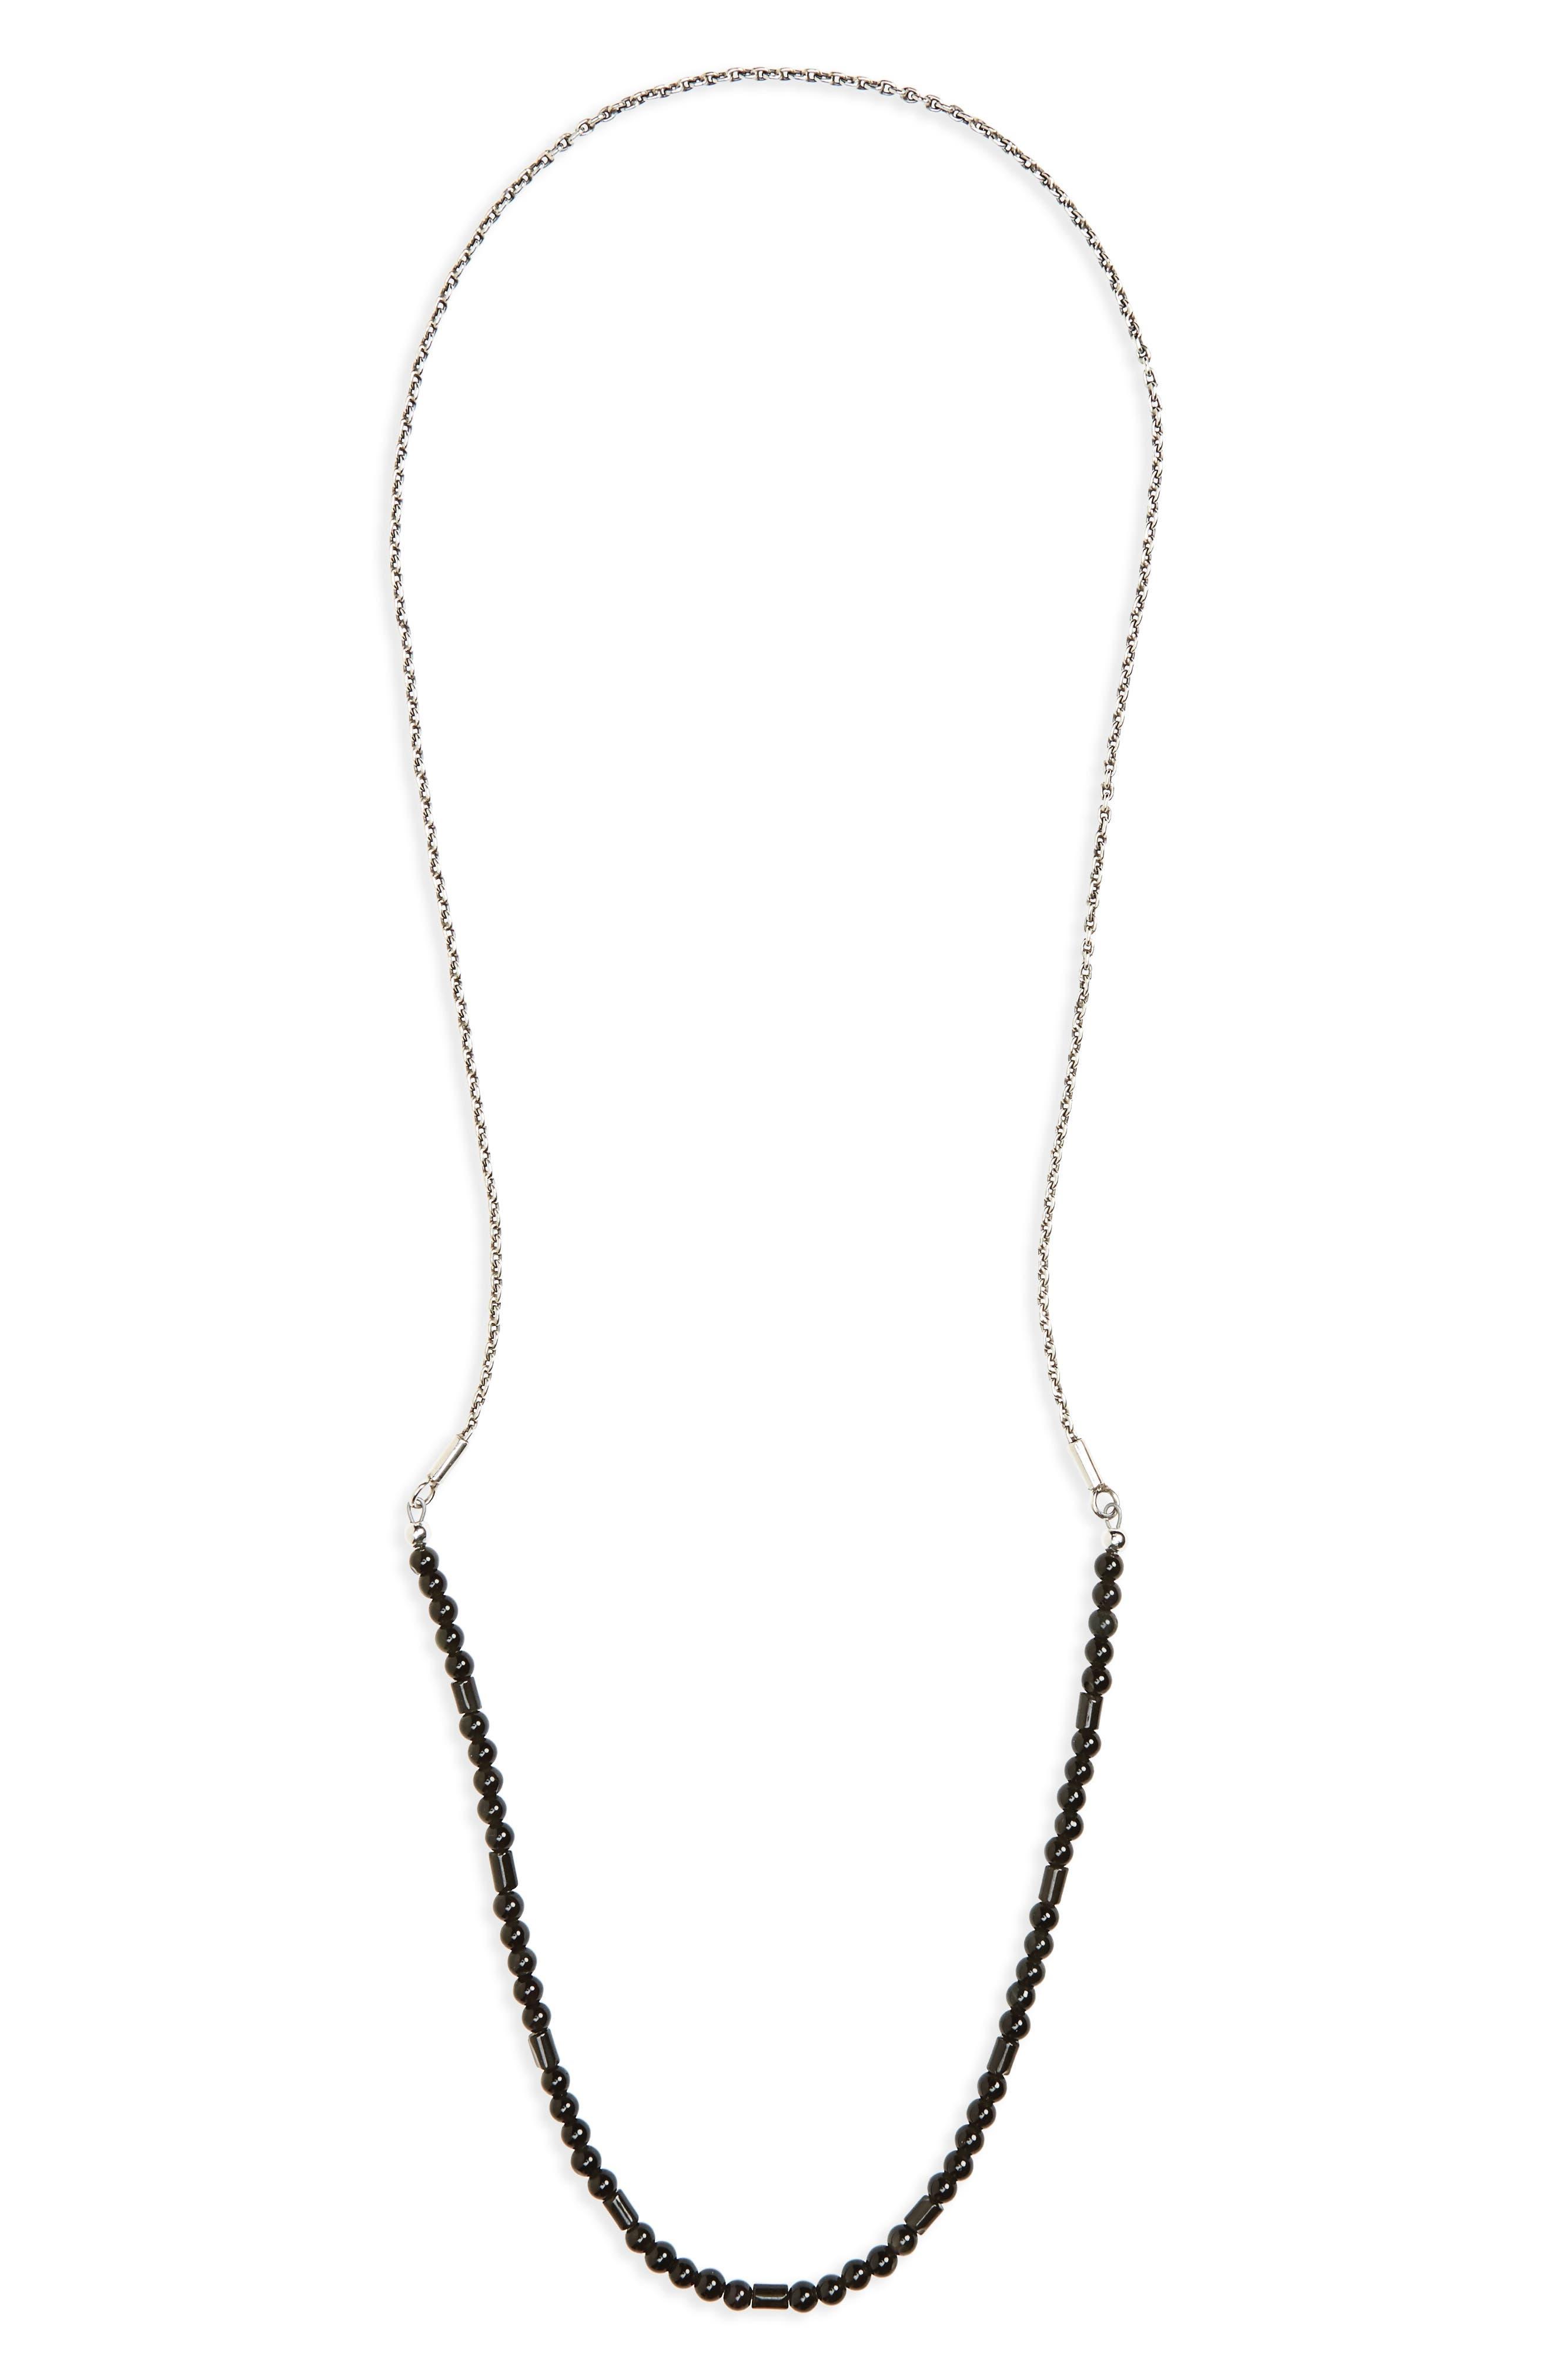 Caputo & Co. Sterling Silver & Stone Necklace